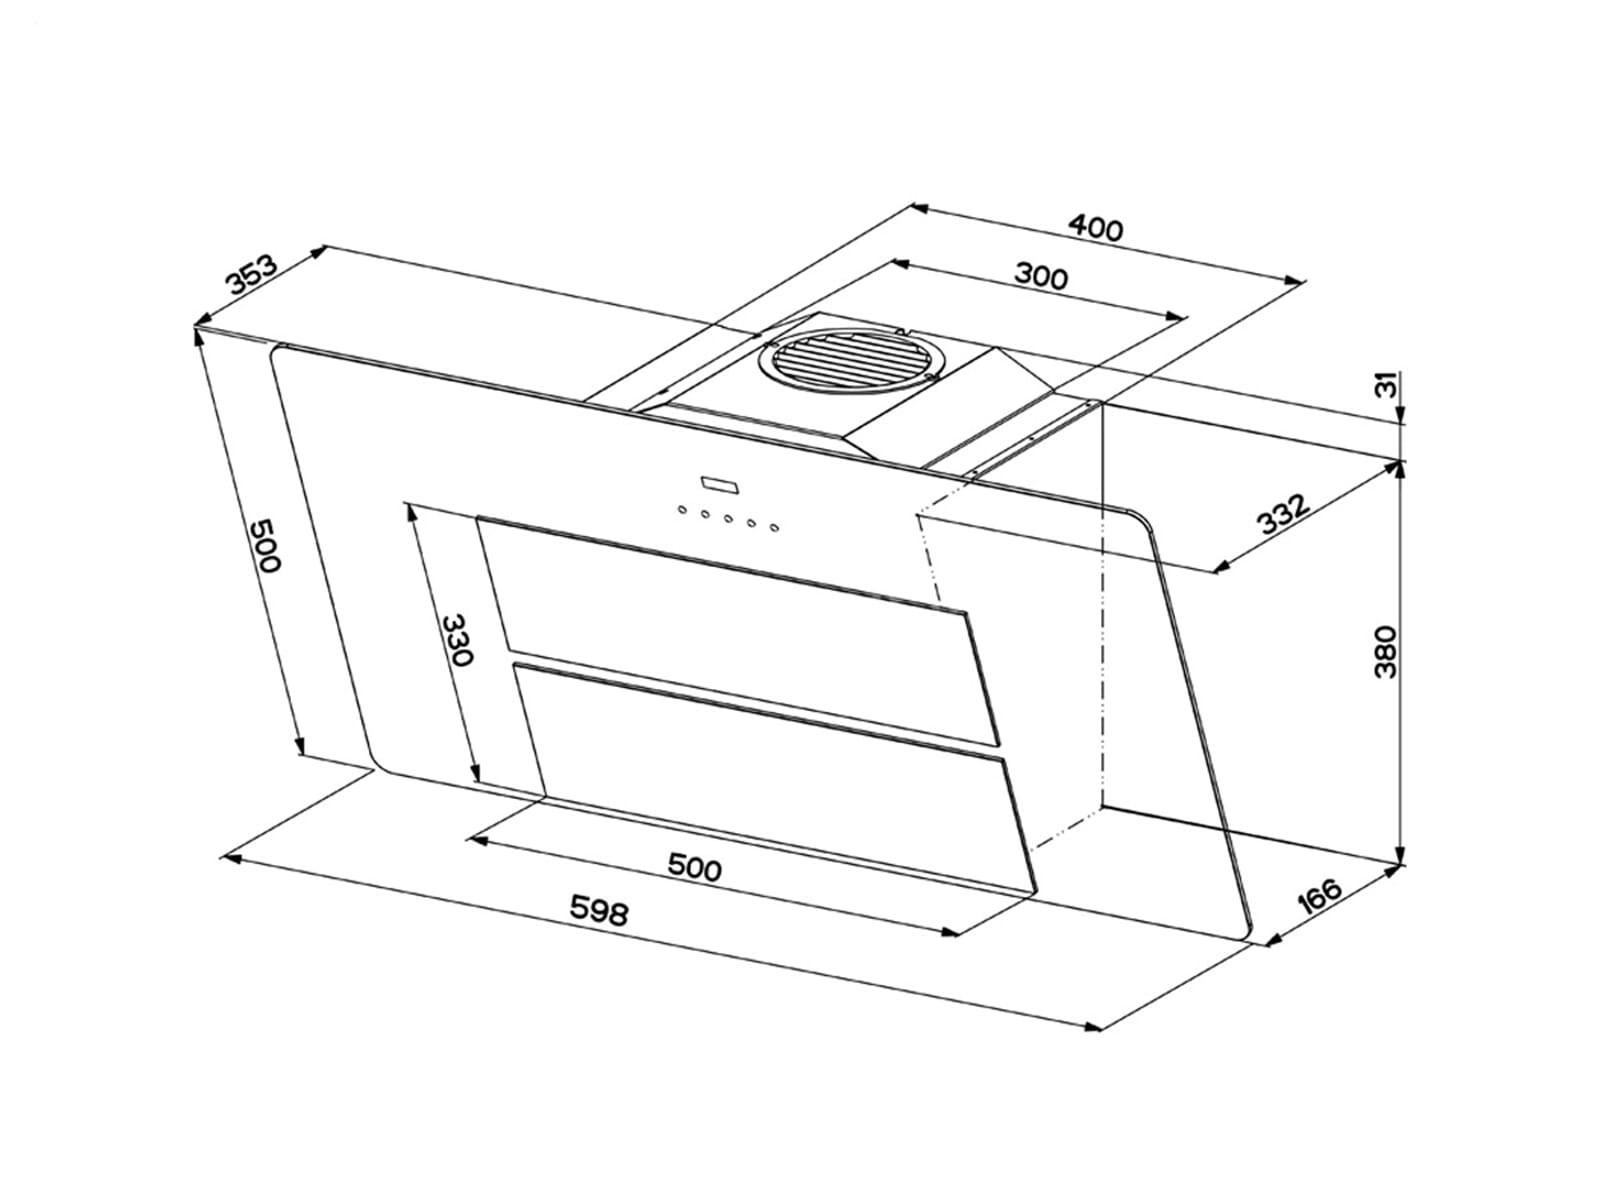 franke maris fma 605 pg kopffreihaube wand esse dunstabzugshaube perlgrau haube ebay. Black Bedroom Furniture Sets. Home Design Ideas